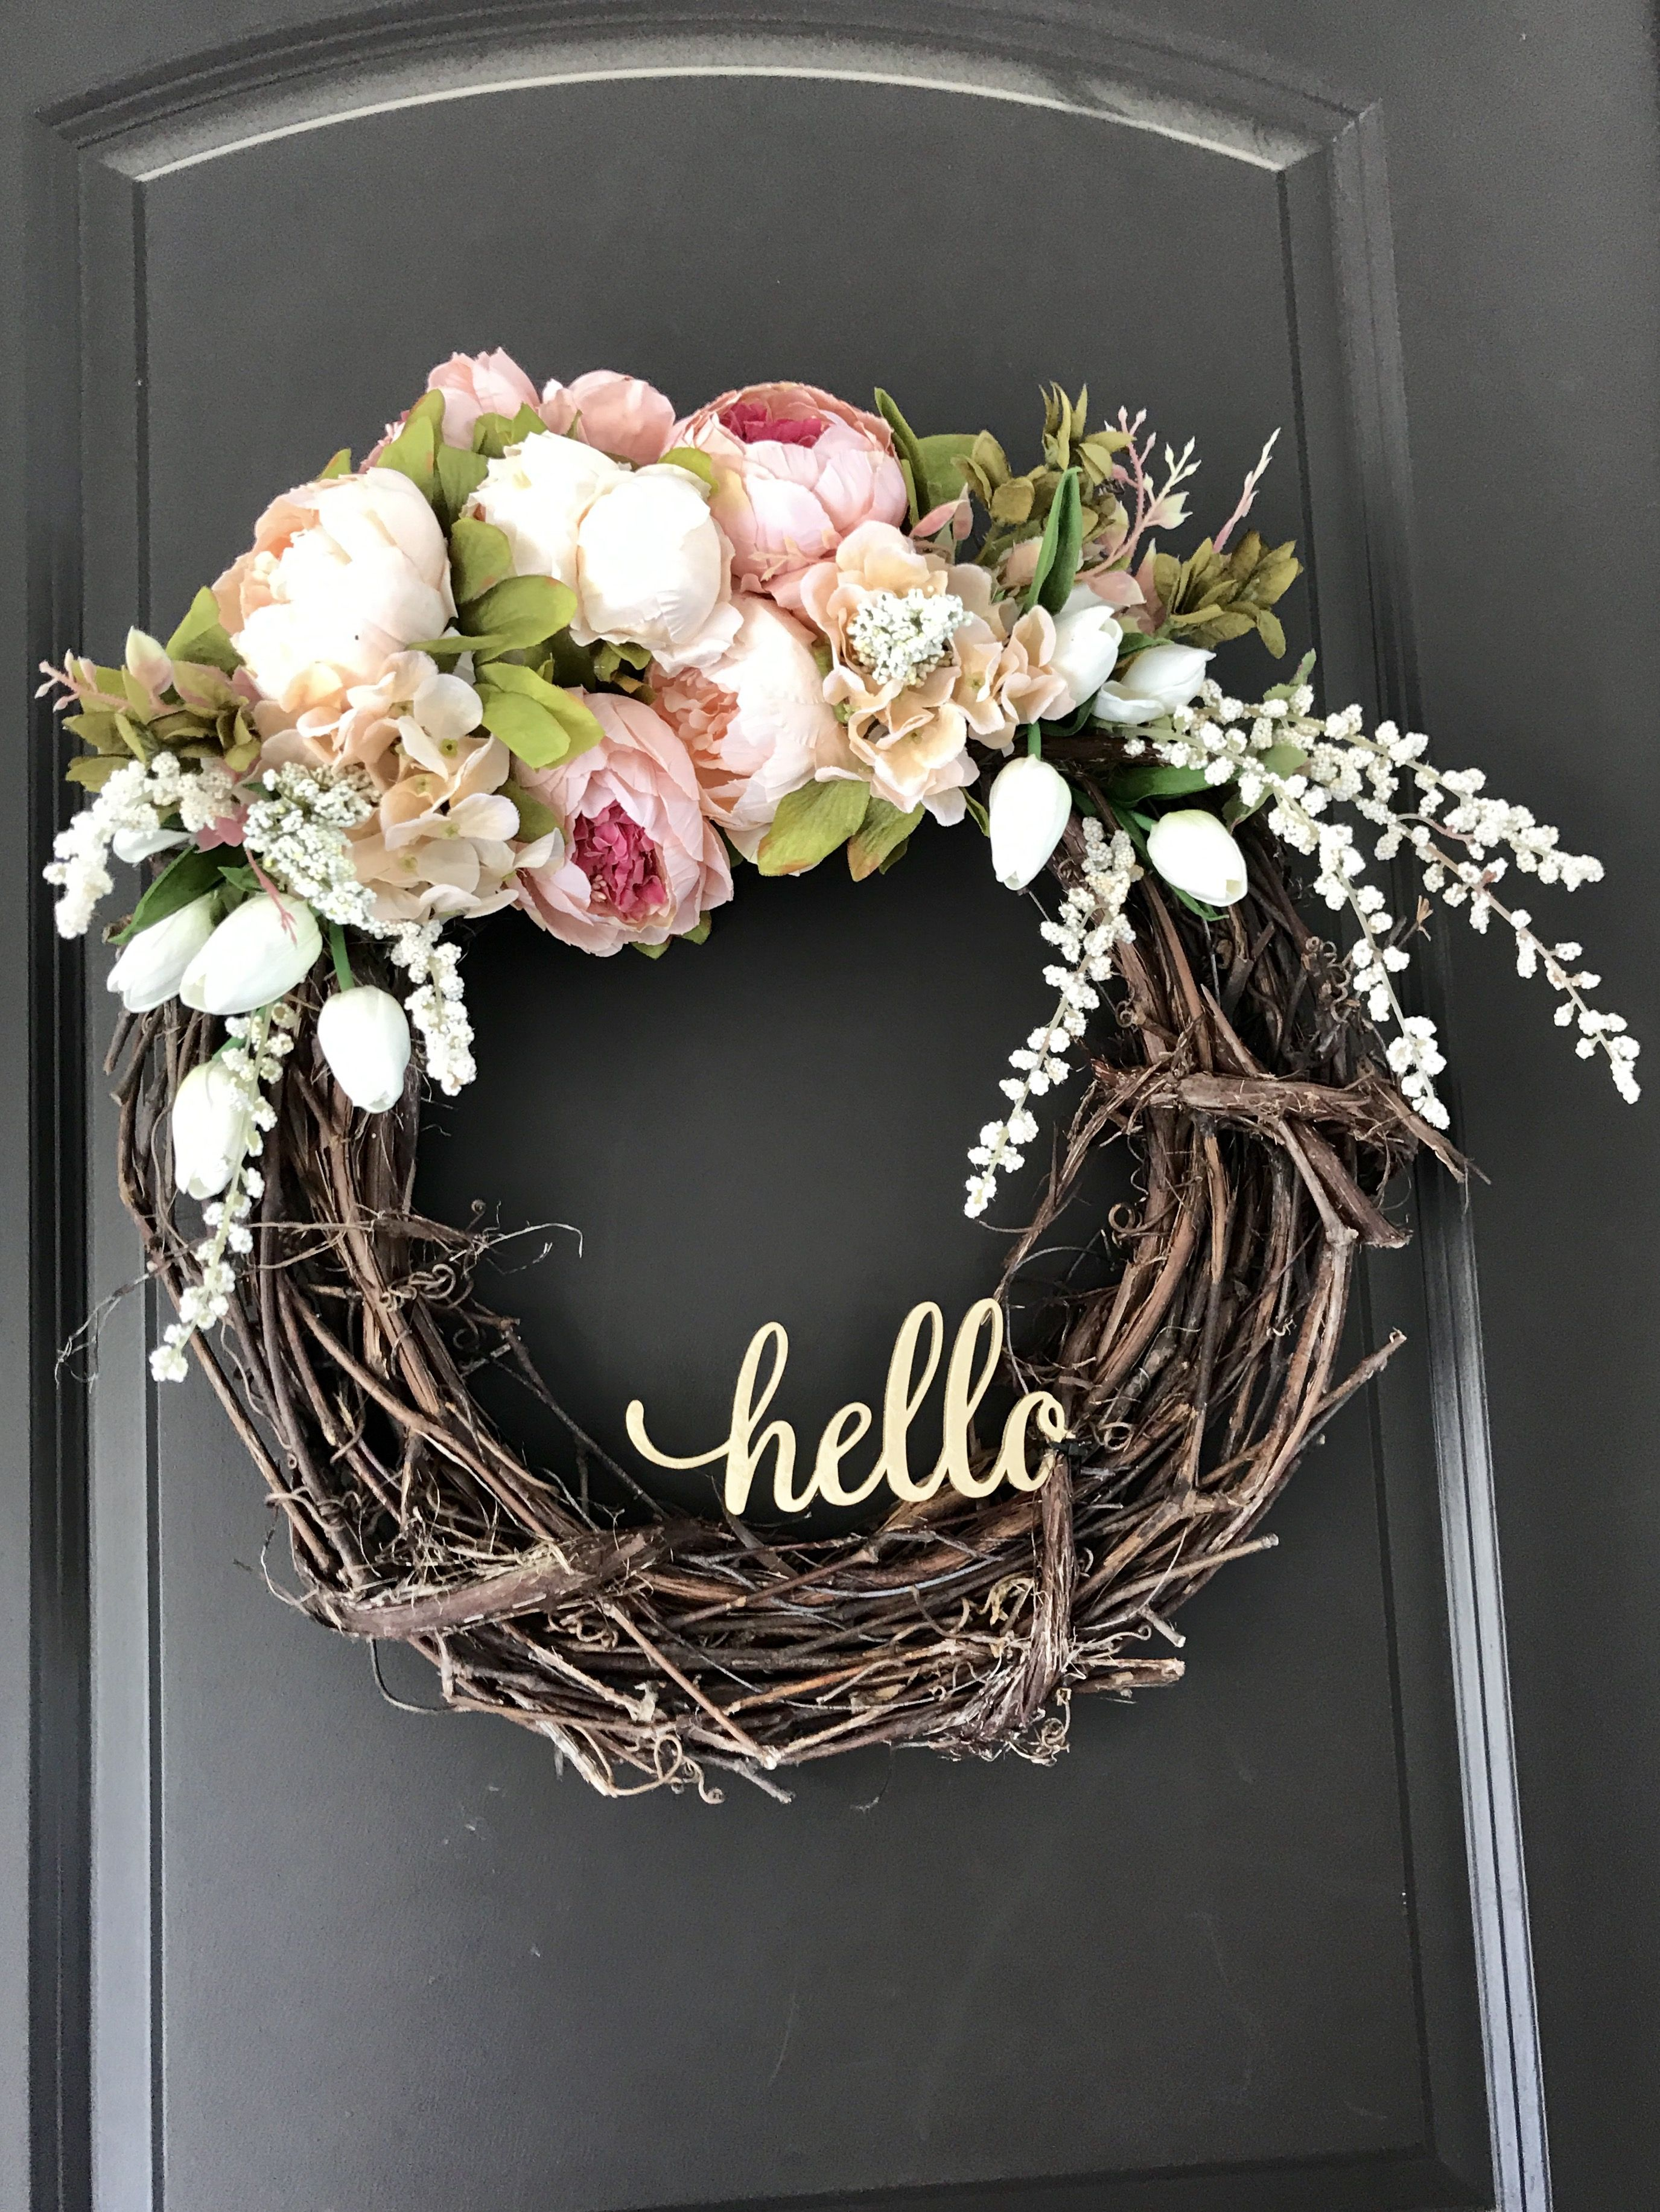 Diy Wreath Hello Front Door Gold Peony White Tulip Wisteria Hello Spring Door Wreaths Diy Wreath Diy Spring Wreath